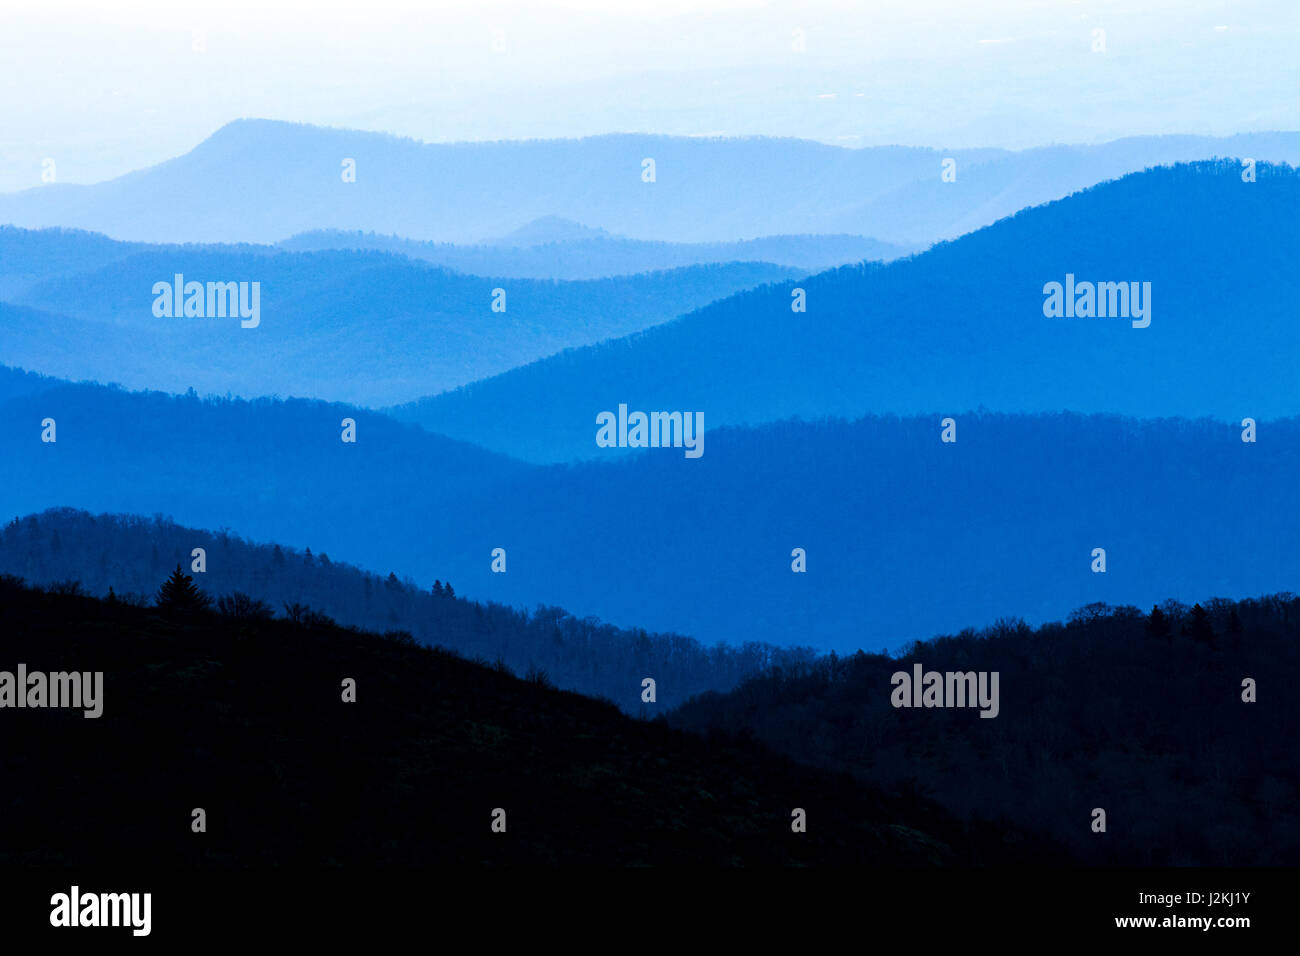 Hazy views of Blue Ridge Mountains from Art Loeb Trail near Black Balsam Knob - Blue Ridge Parkway, North Carolina, - Stock Image